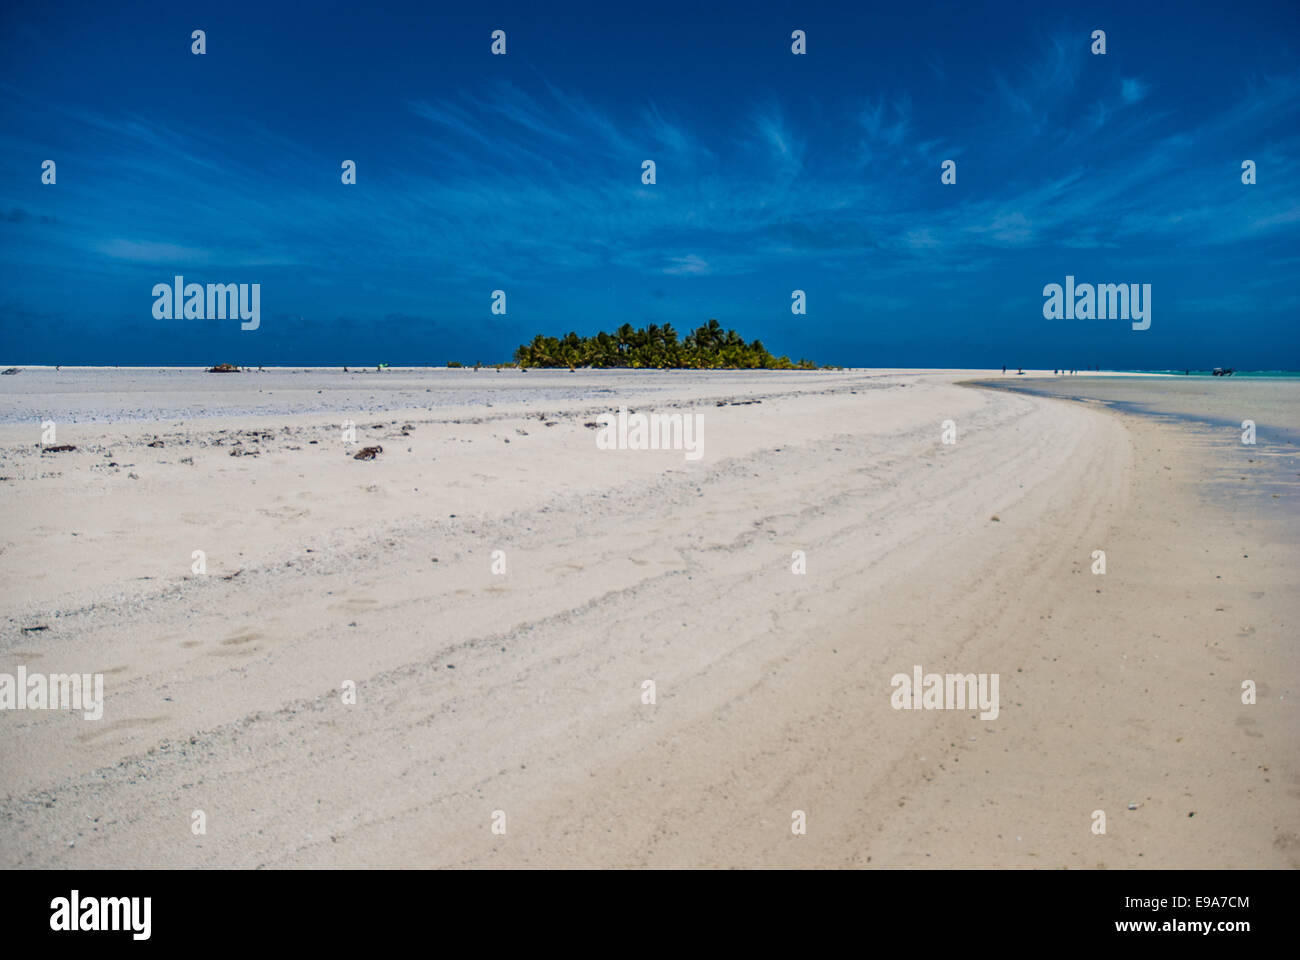 Aitutaki - Stock Image